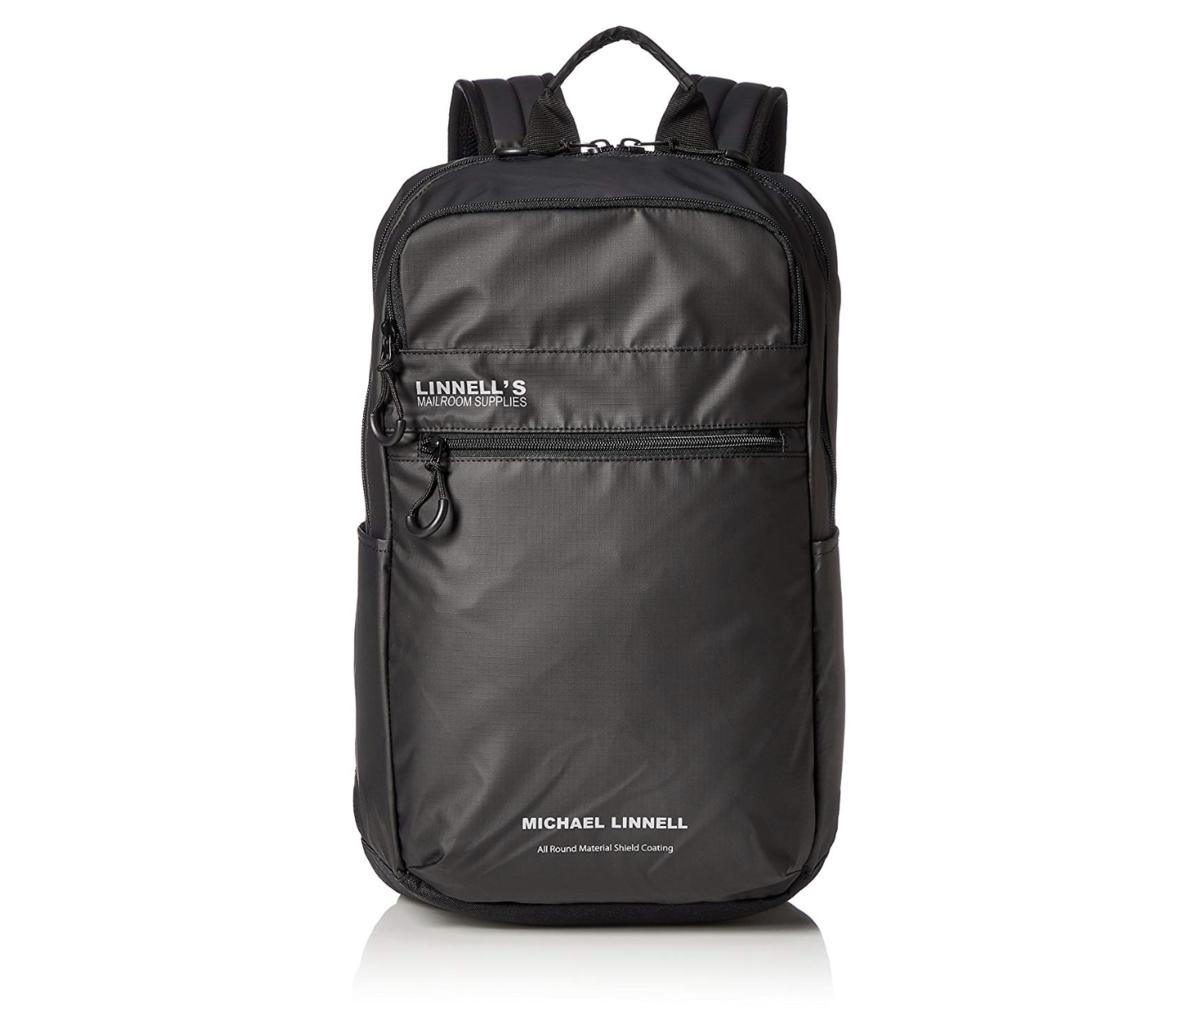 f:id:thebackpack:20190720213548p:plain